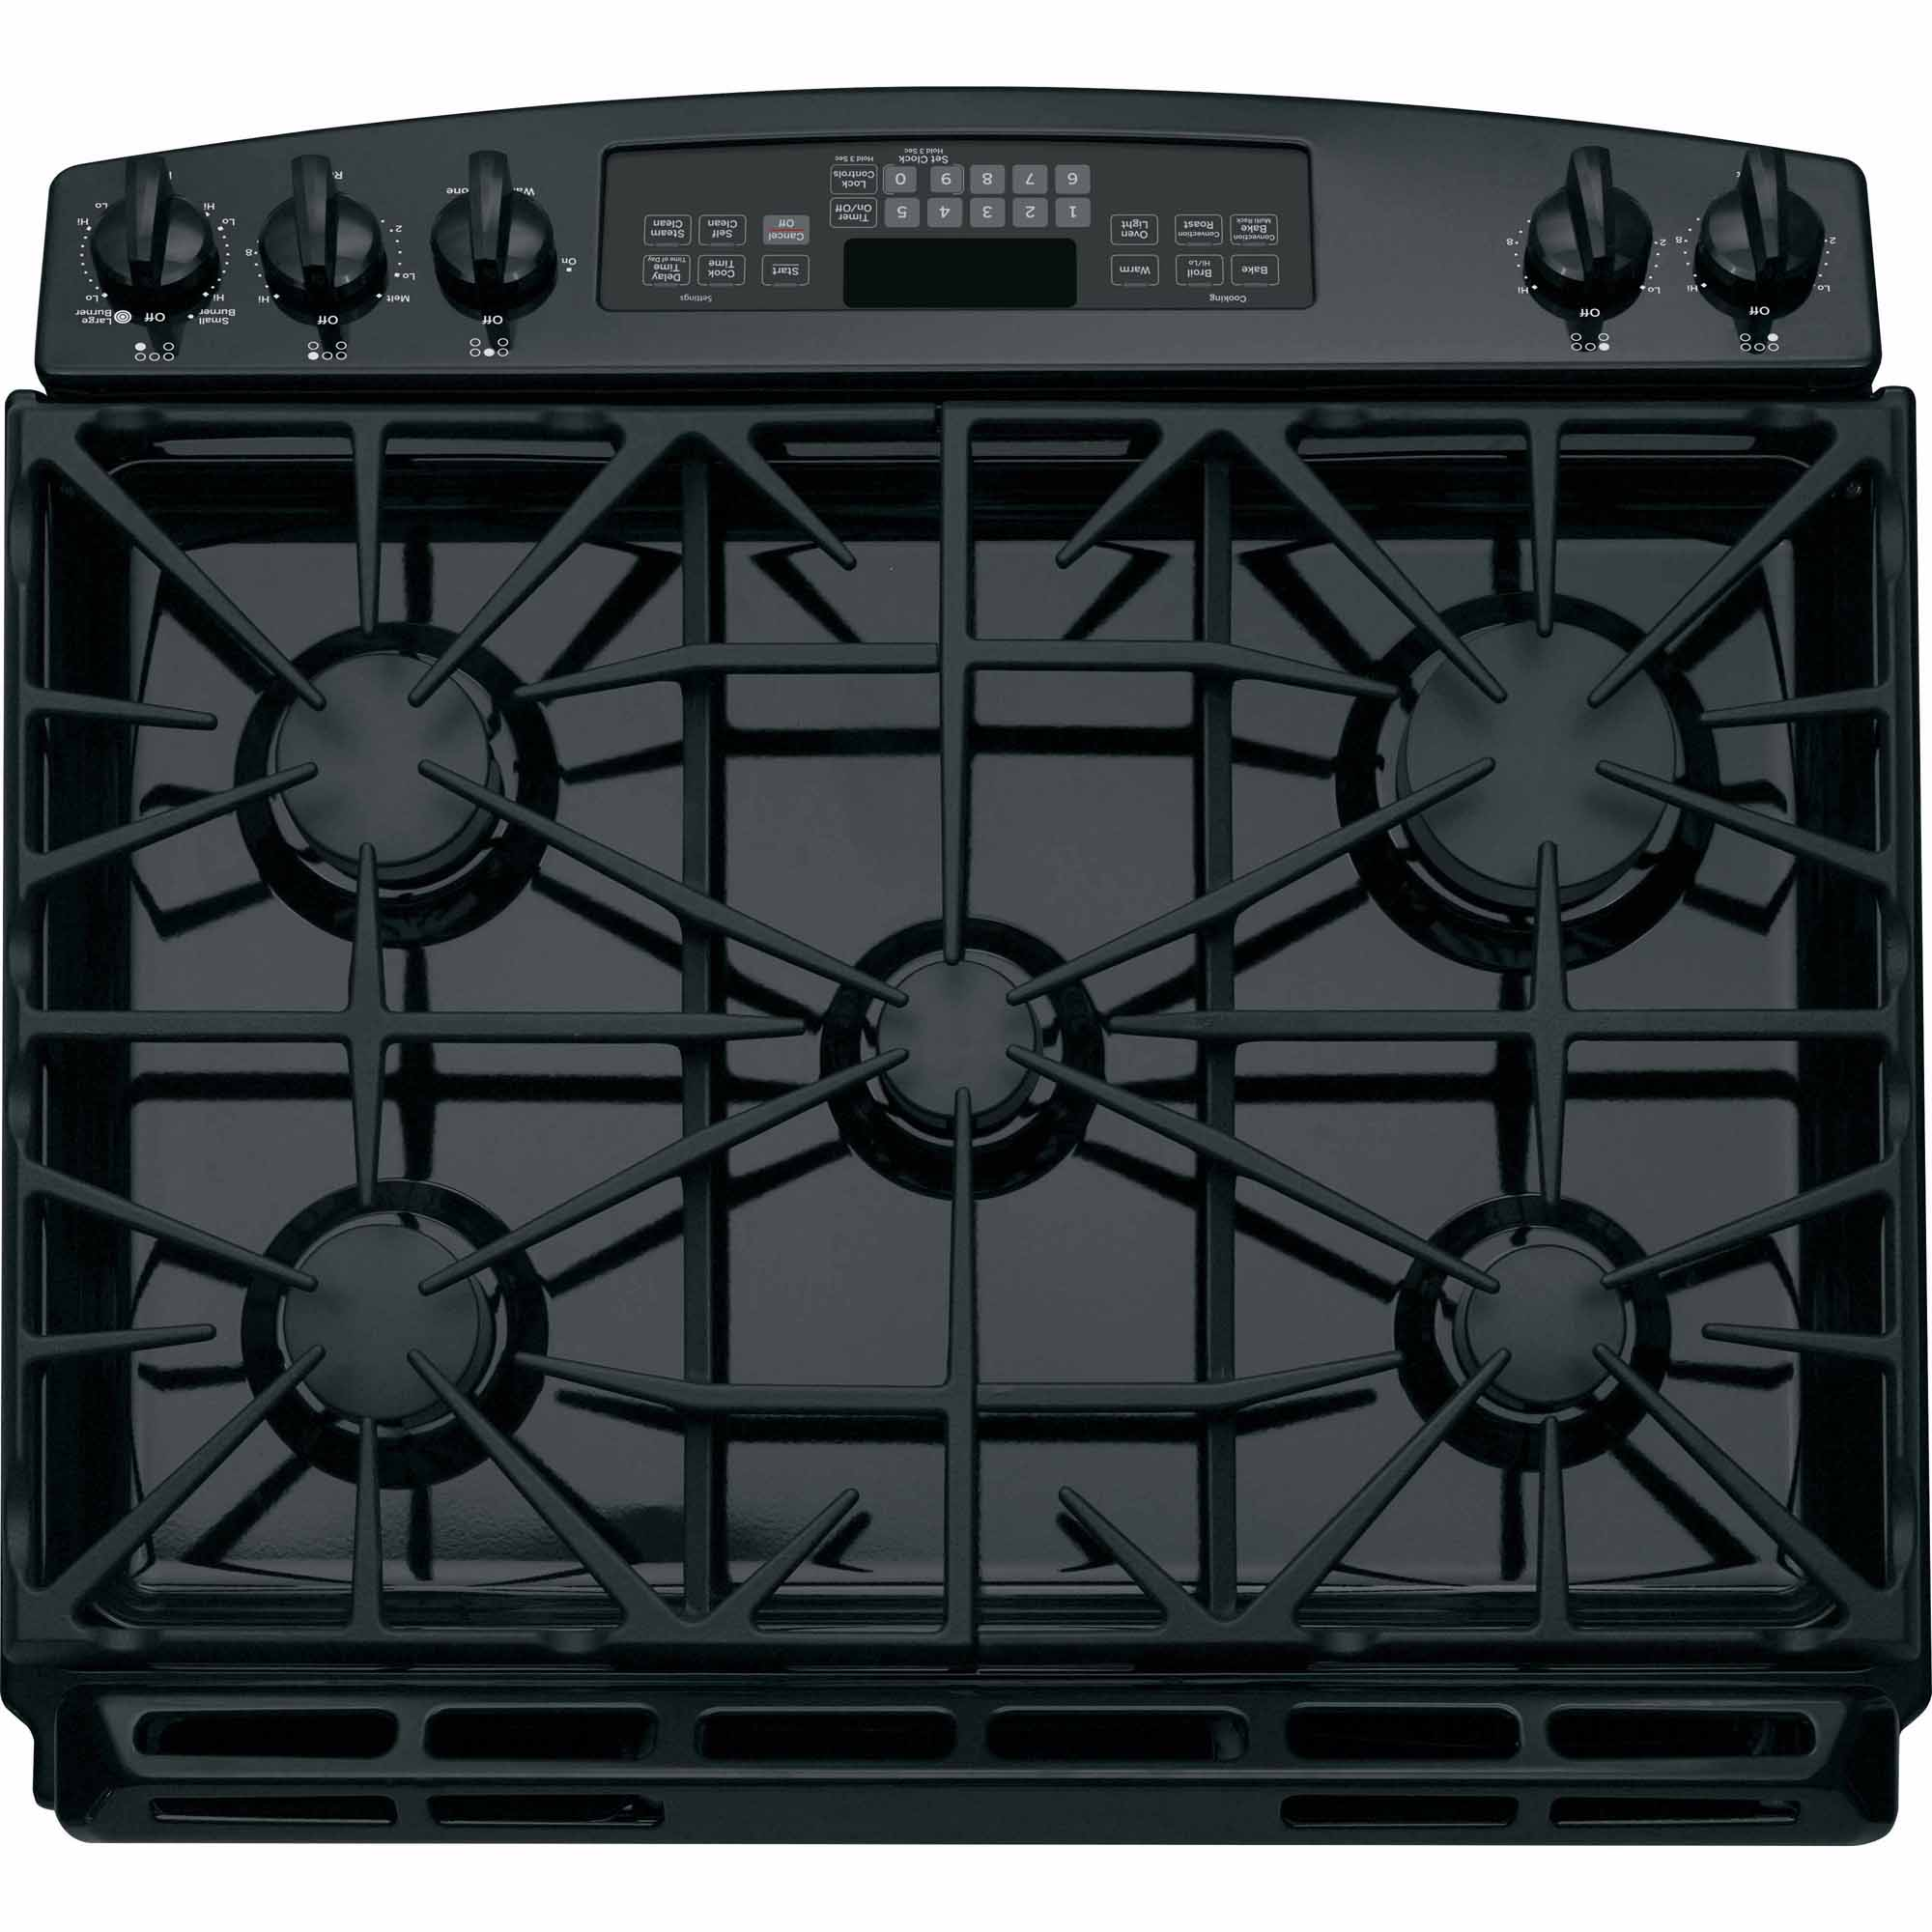 GE Appliances JGS750DEFBB 5.6 cu. ft. Slide-In Gas Range - Black